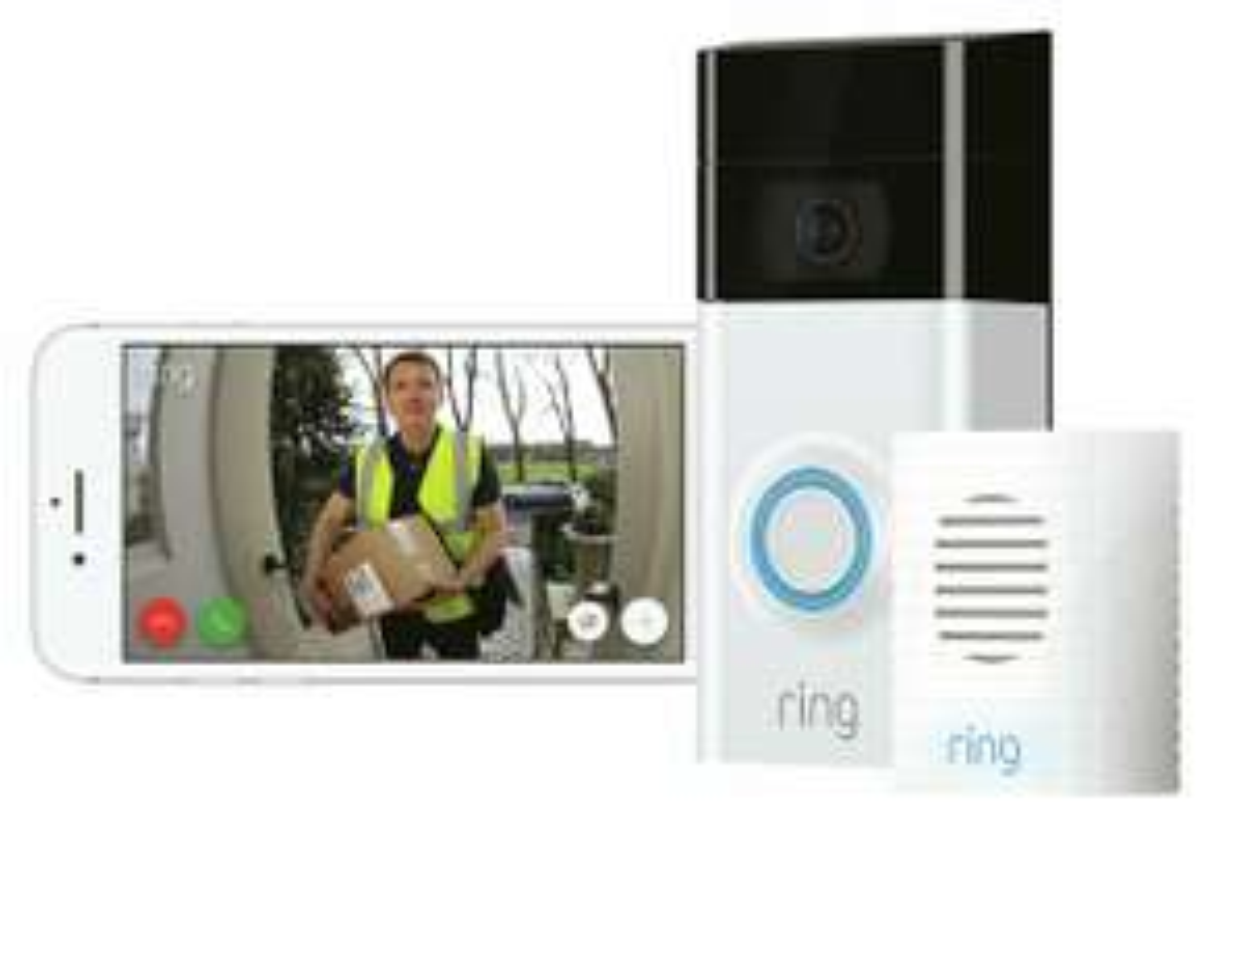 Ring Full HD 1080p Video Doorbell 2 and Chime Bundle - White / Black £111.60 @ Argos eBay